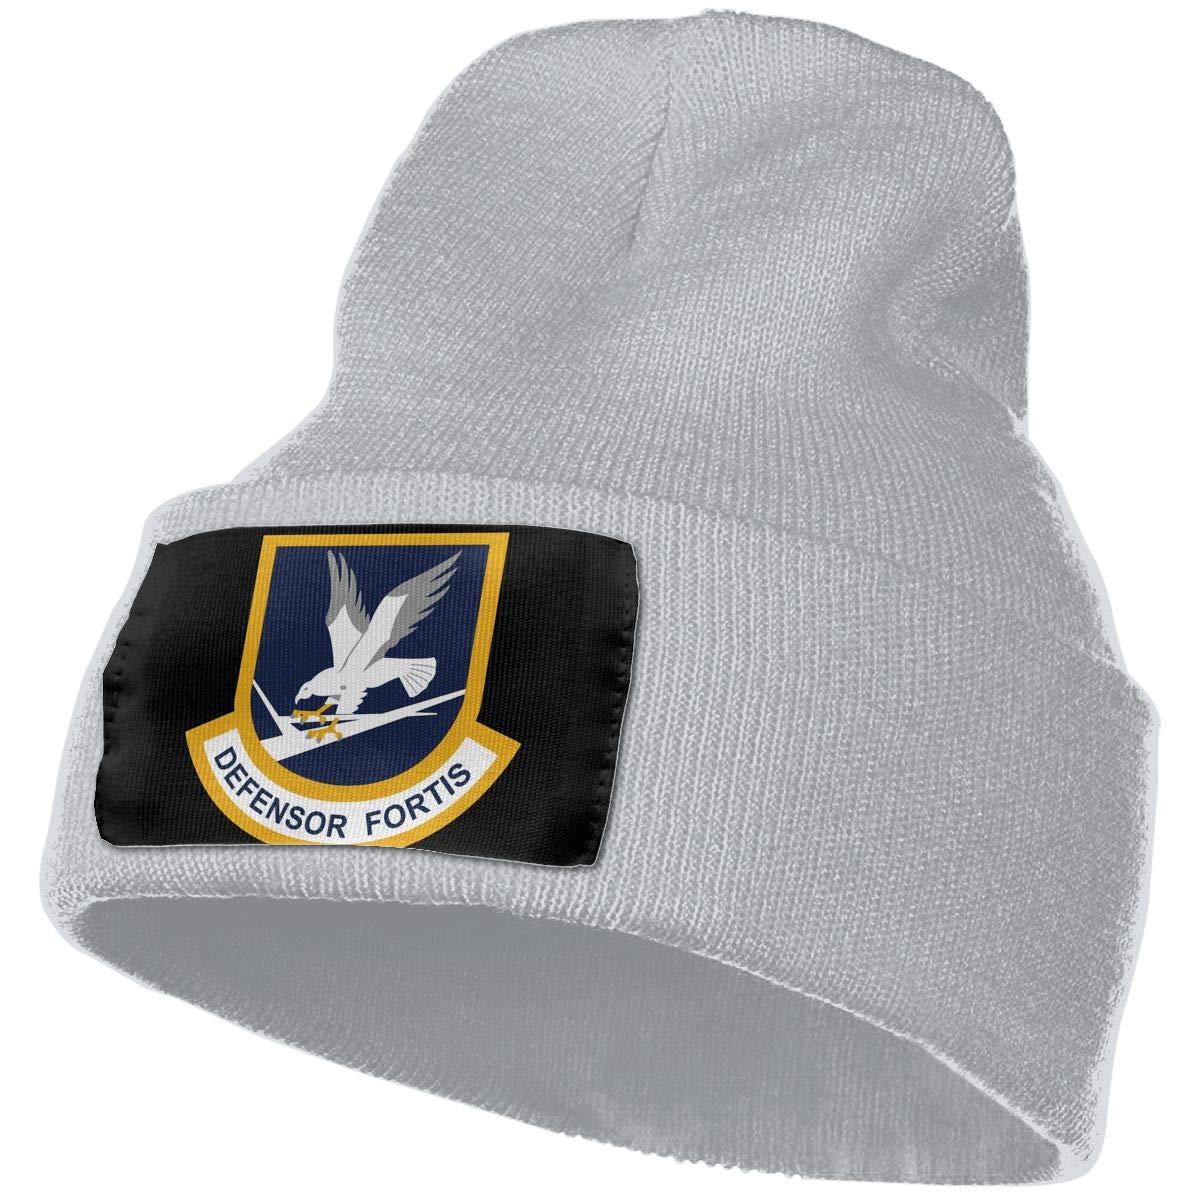 BH Cool Designs #Kaileen Comfortable Dad Hat Baseball Cap